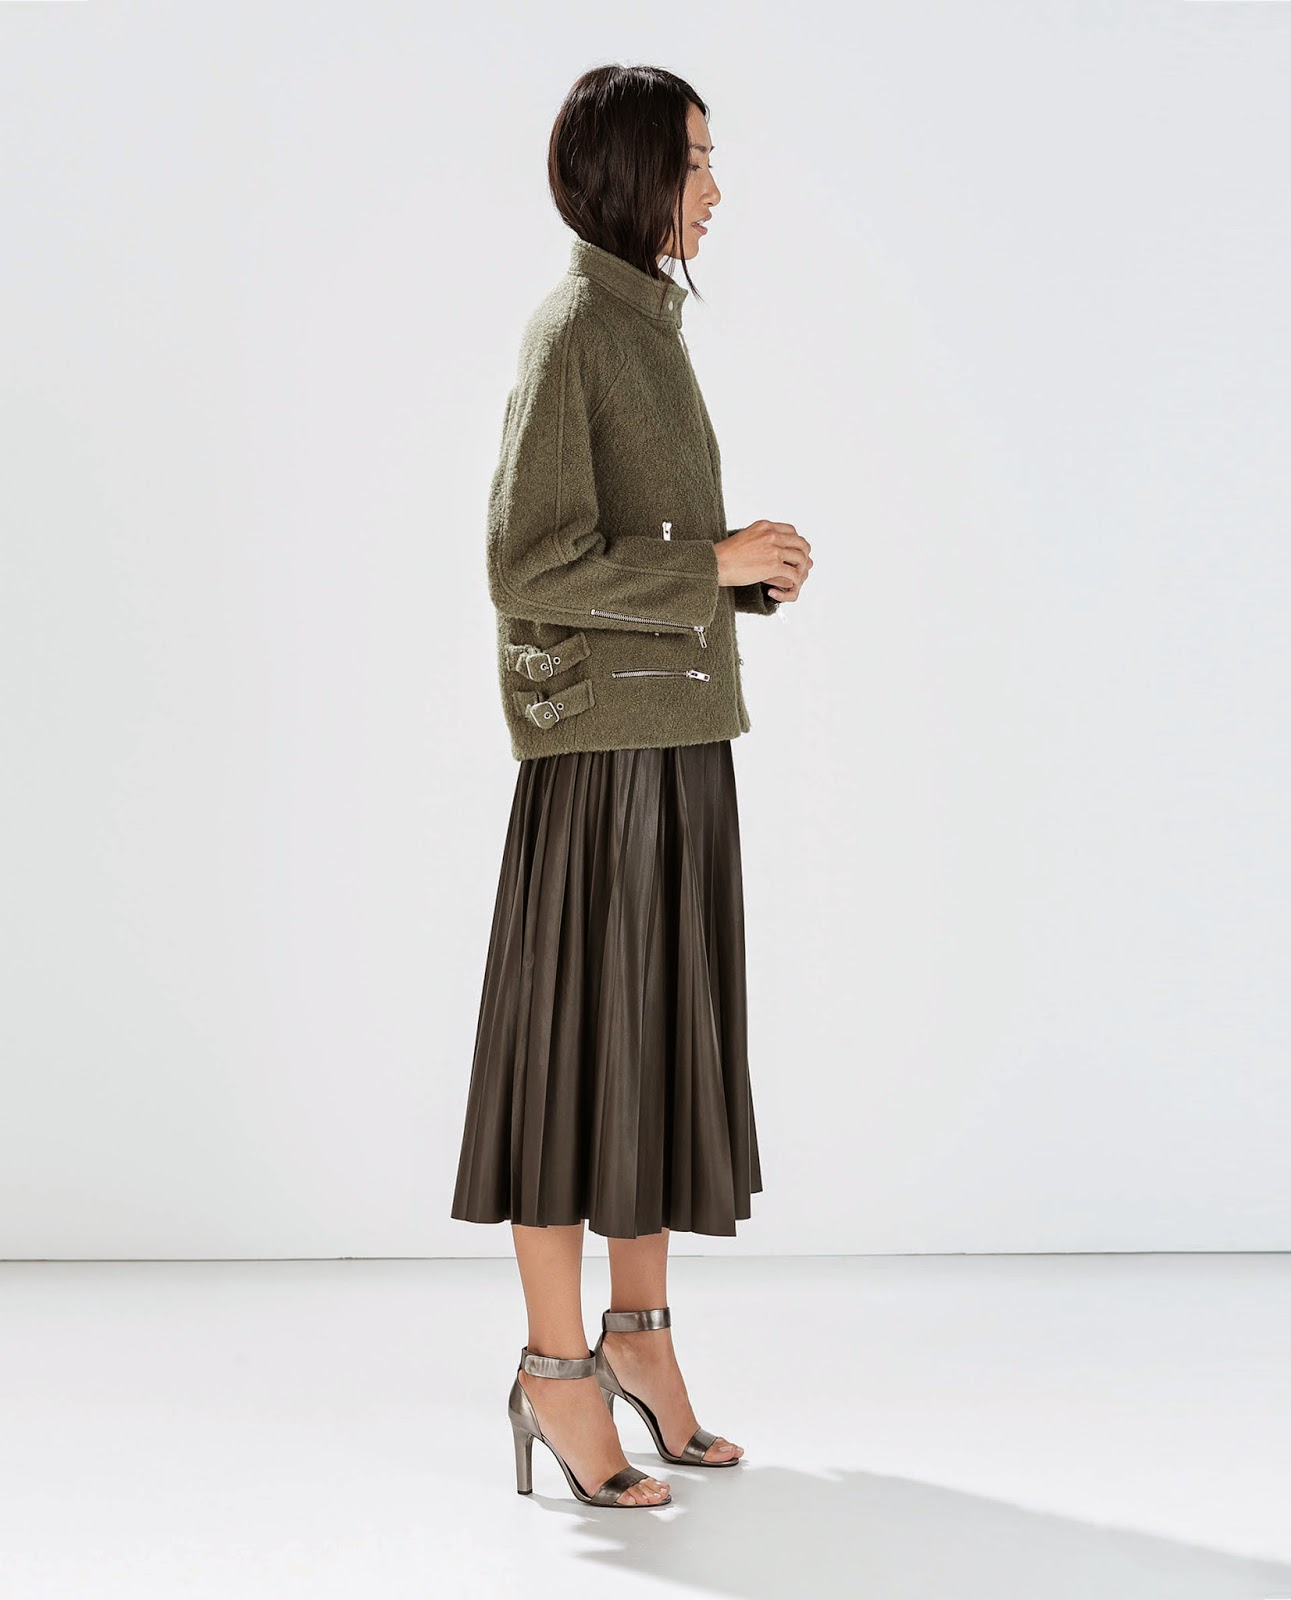 zara khaki skirt